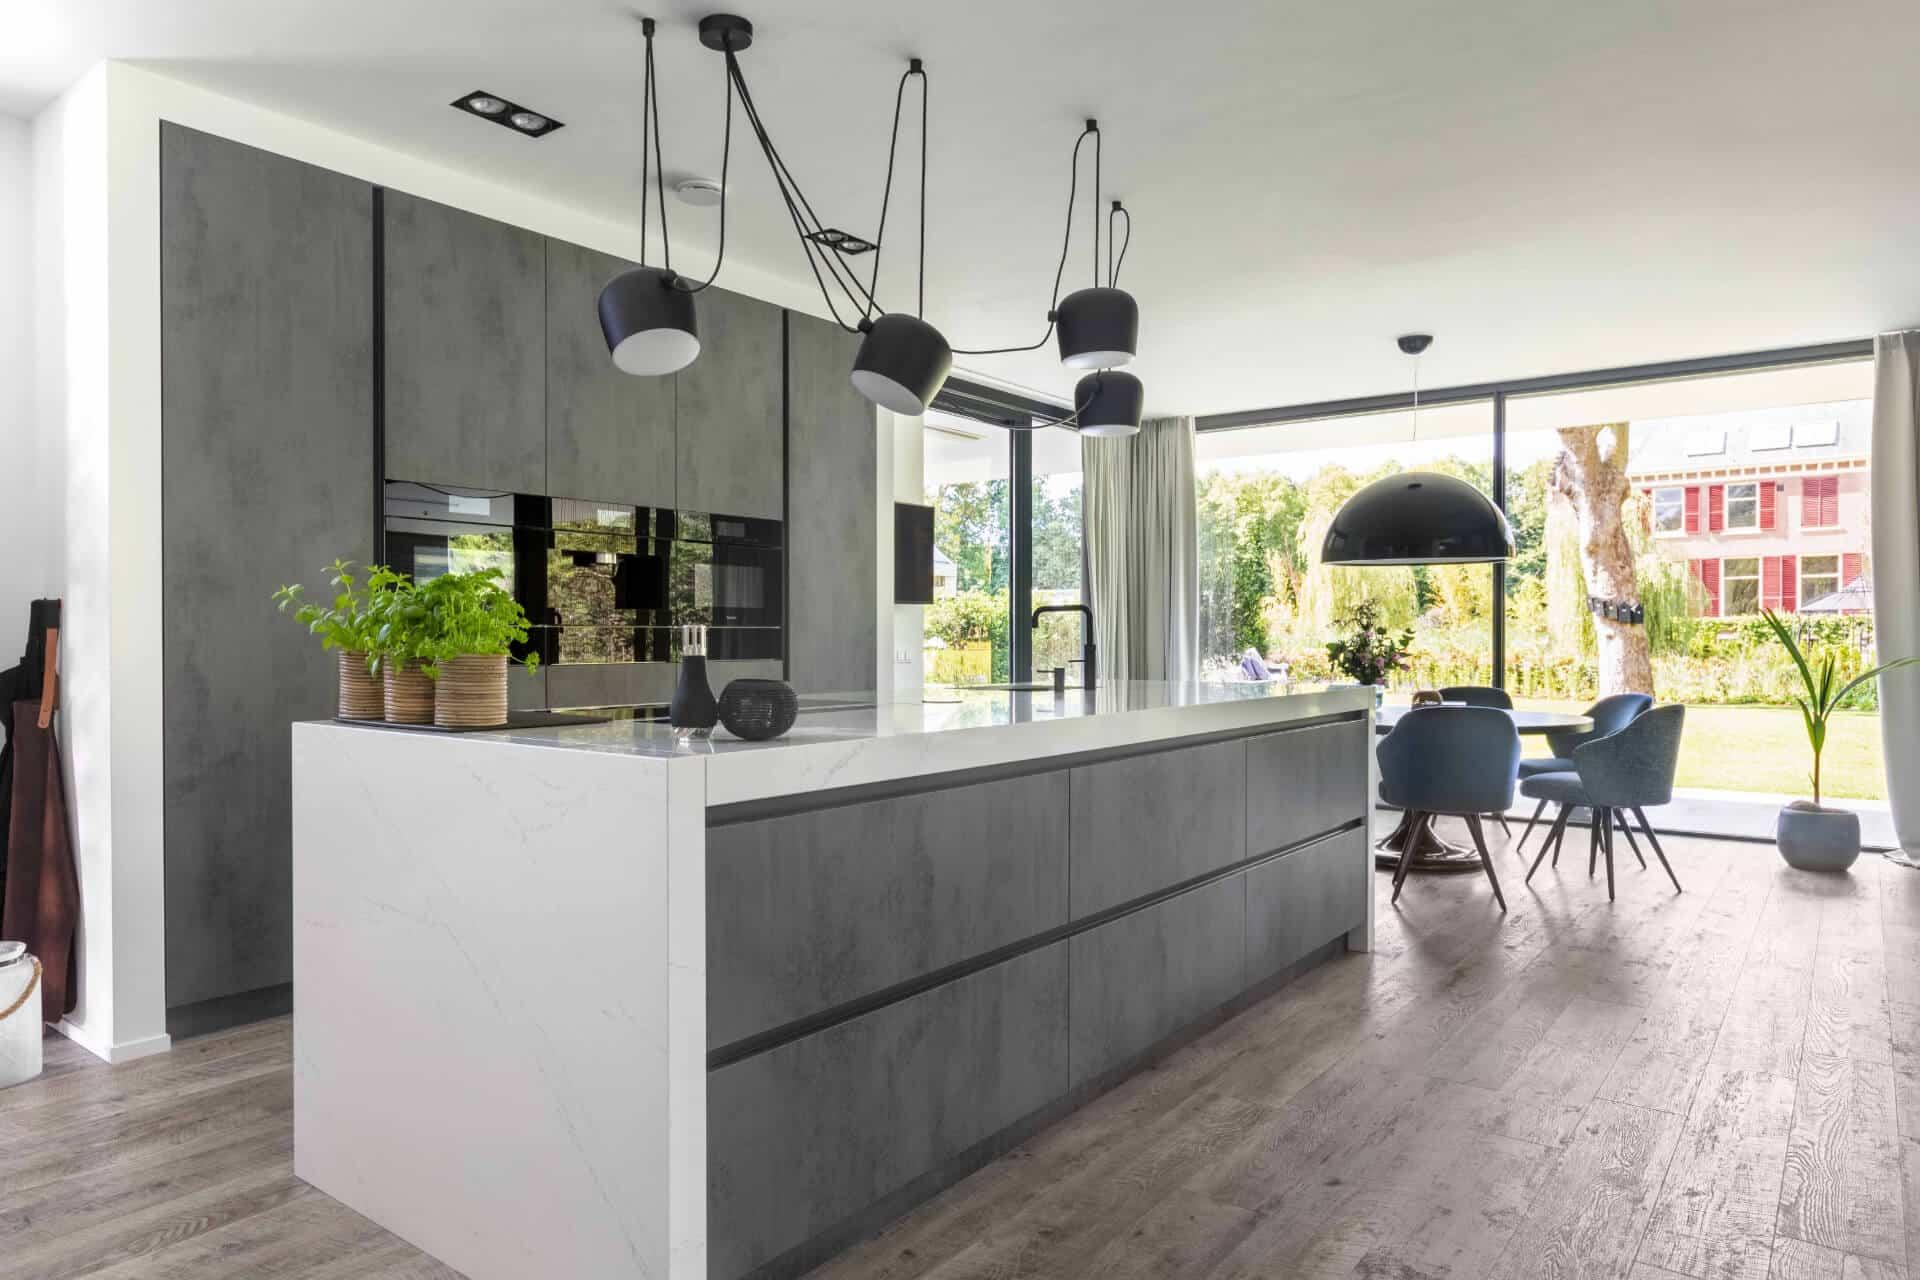 Luxe Design Keuken Lochem Van Ginkel Keukens Barneveld 018